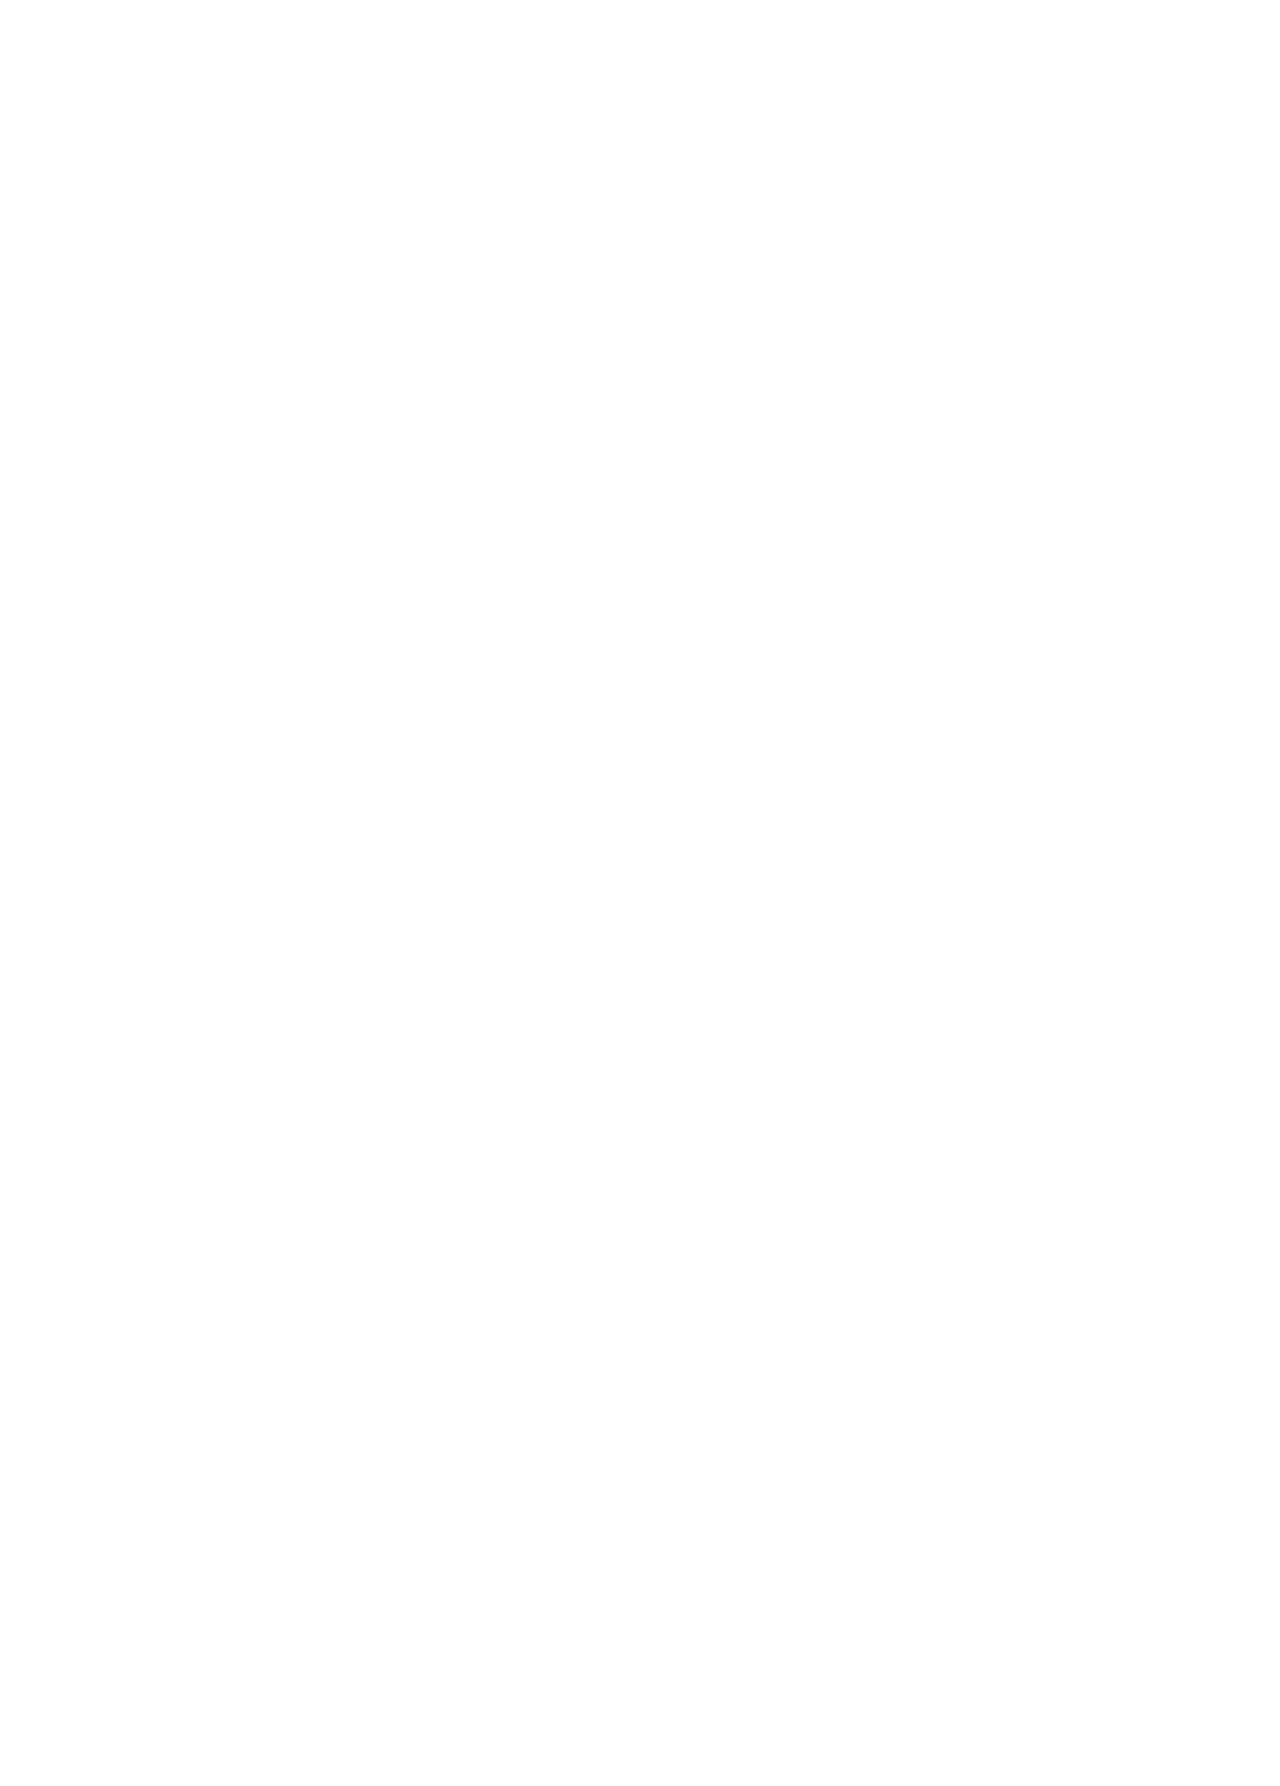 [Bronco Hitoritabi (Uchi-Uchi Keyaki)] Diver-nin Ayame to Ecchi na Mokeiya no Onee-san (Gundam Build Divers) [Digital] 22